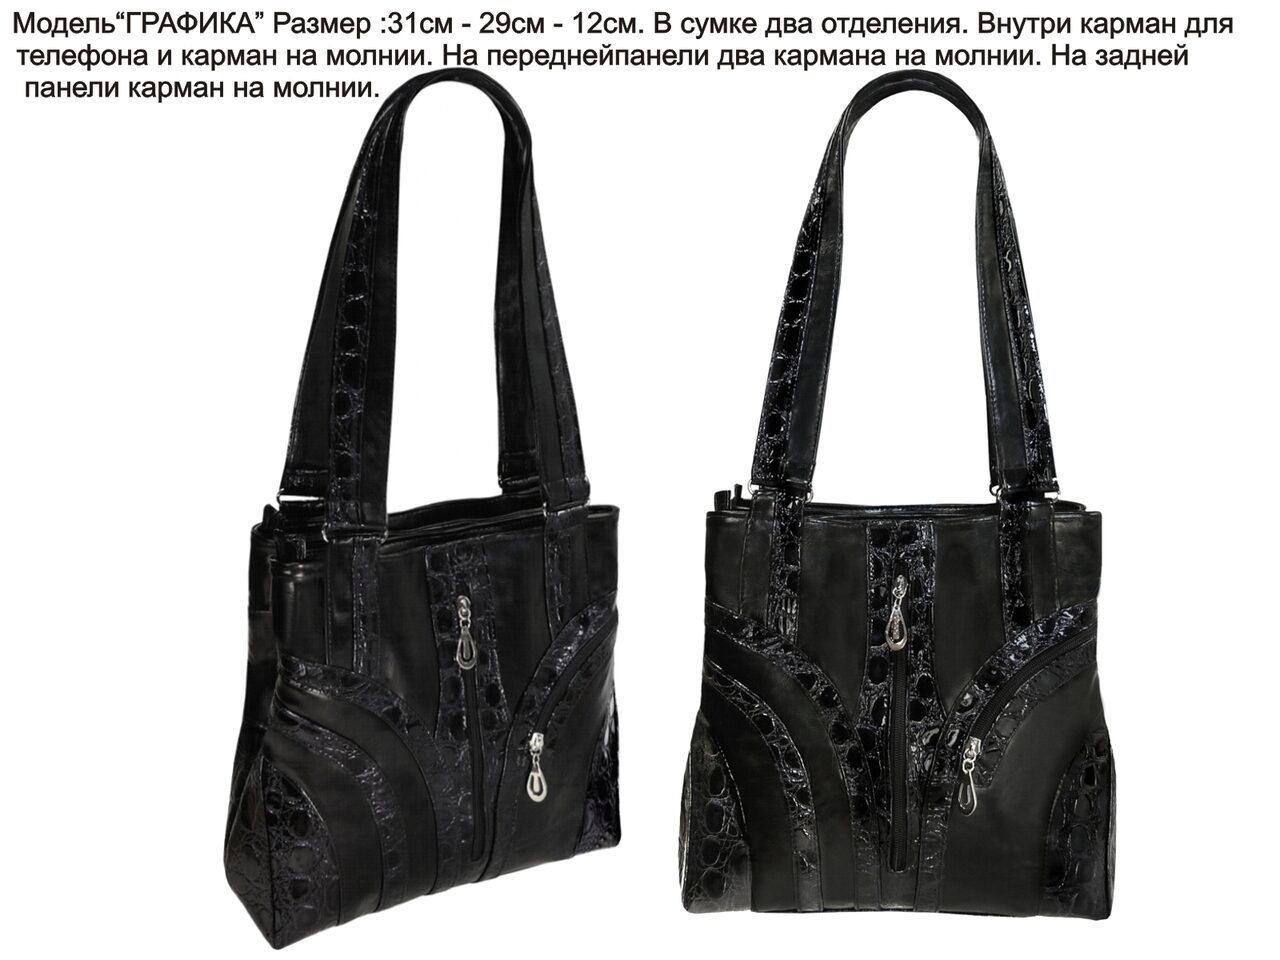 479d23faab74 Женская сумка ; сумка женская ; производство женских сумок ...